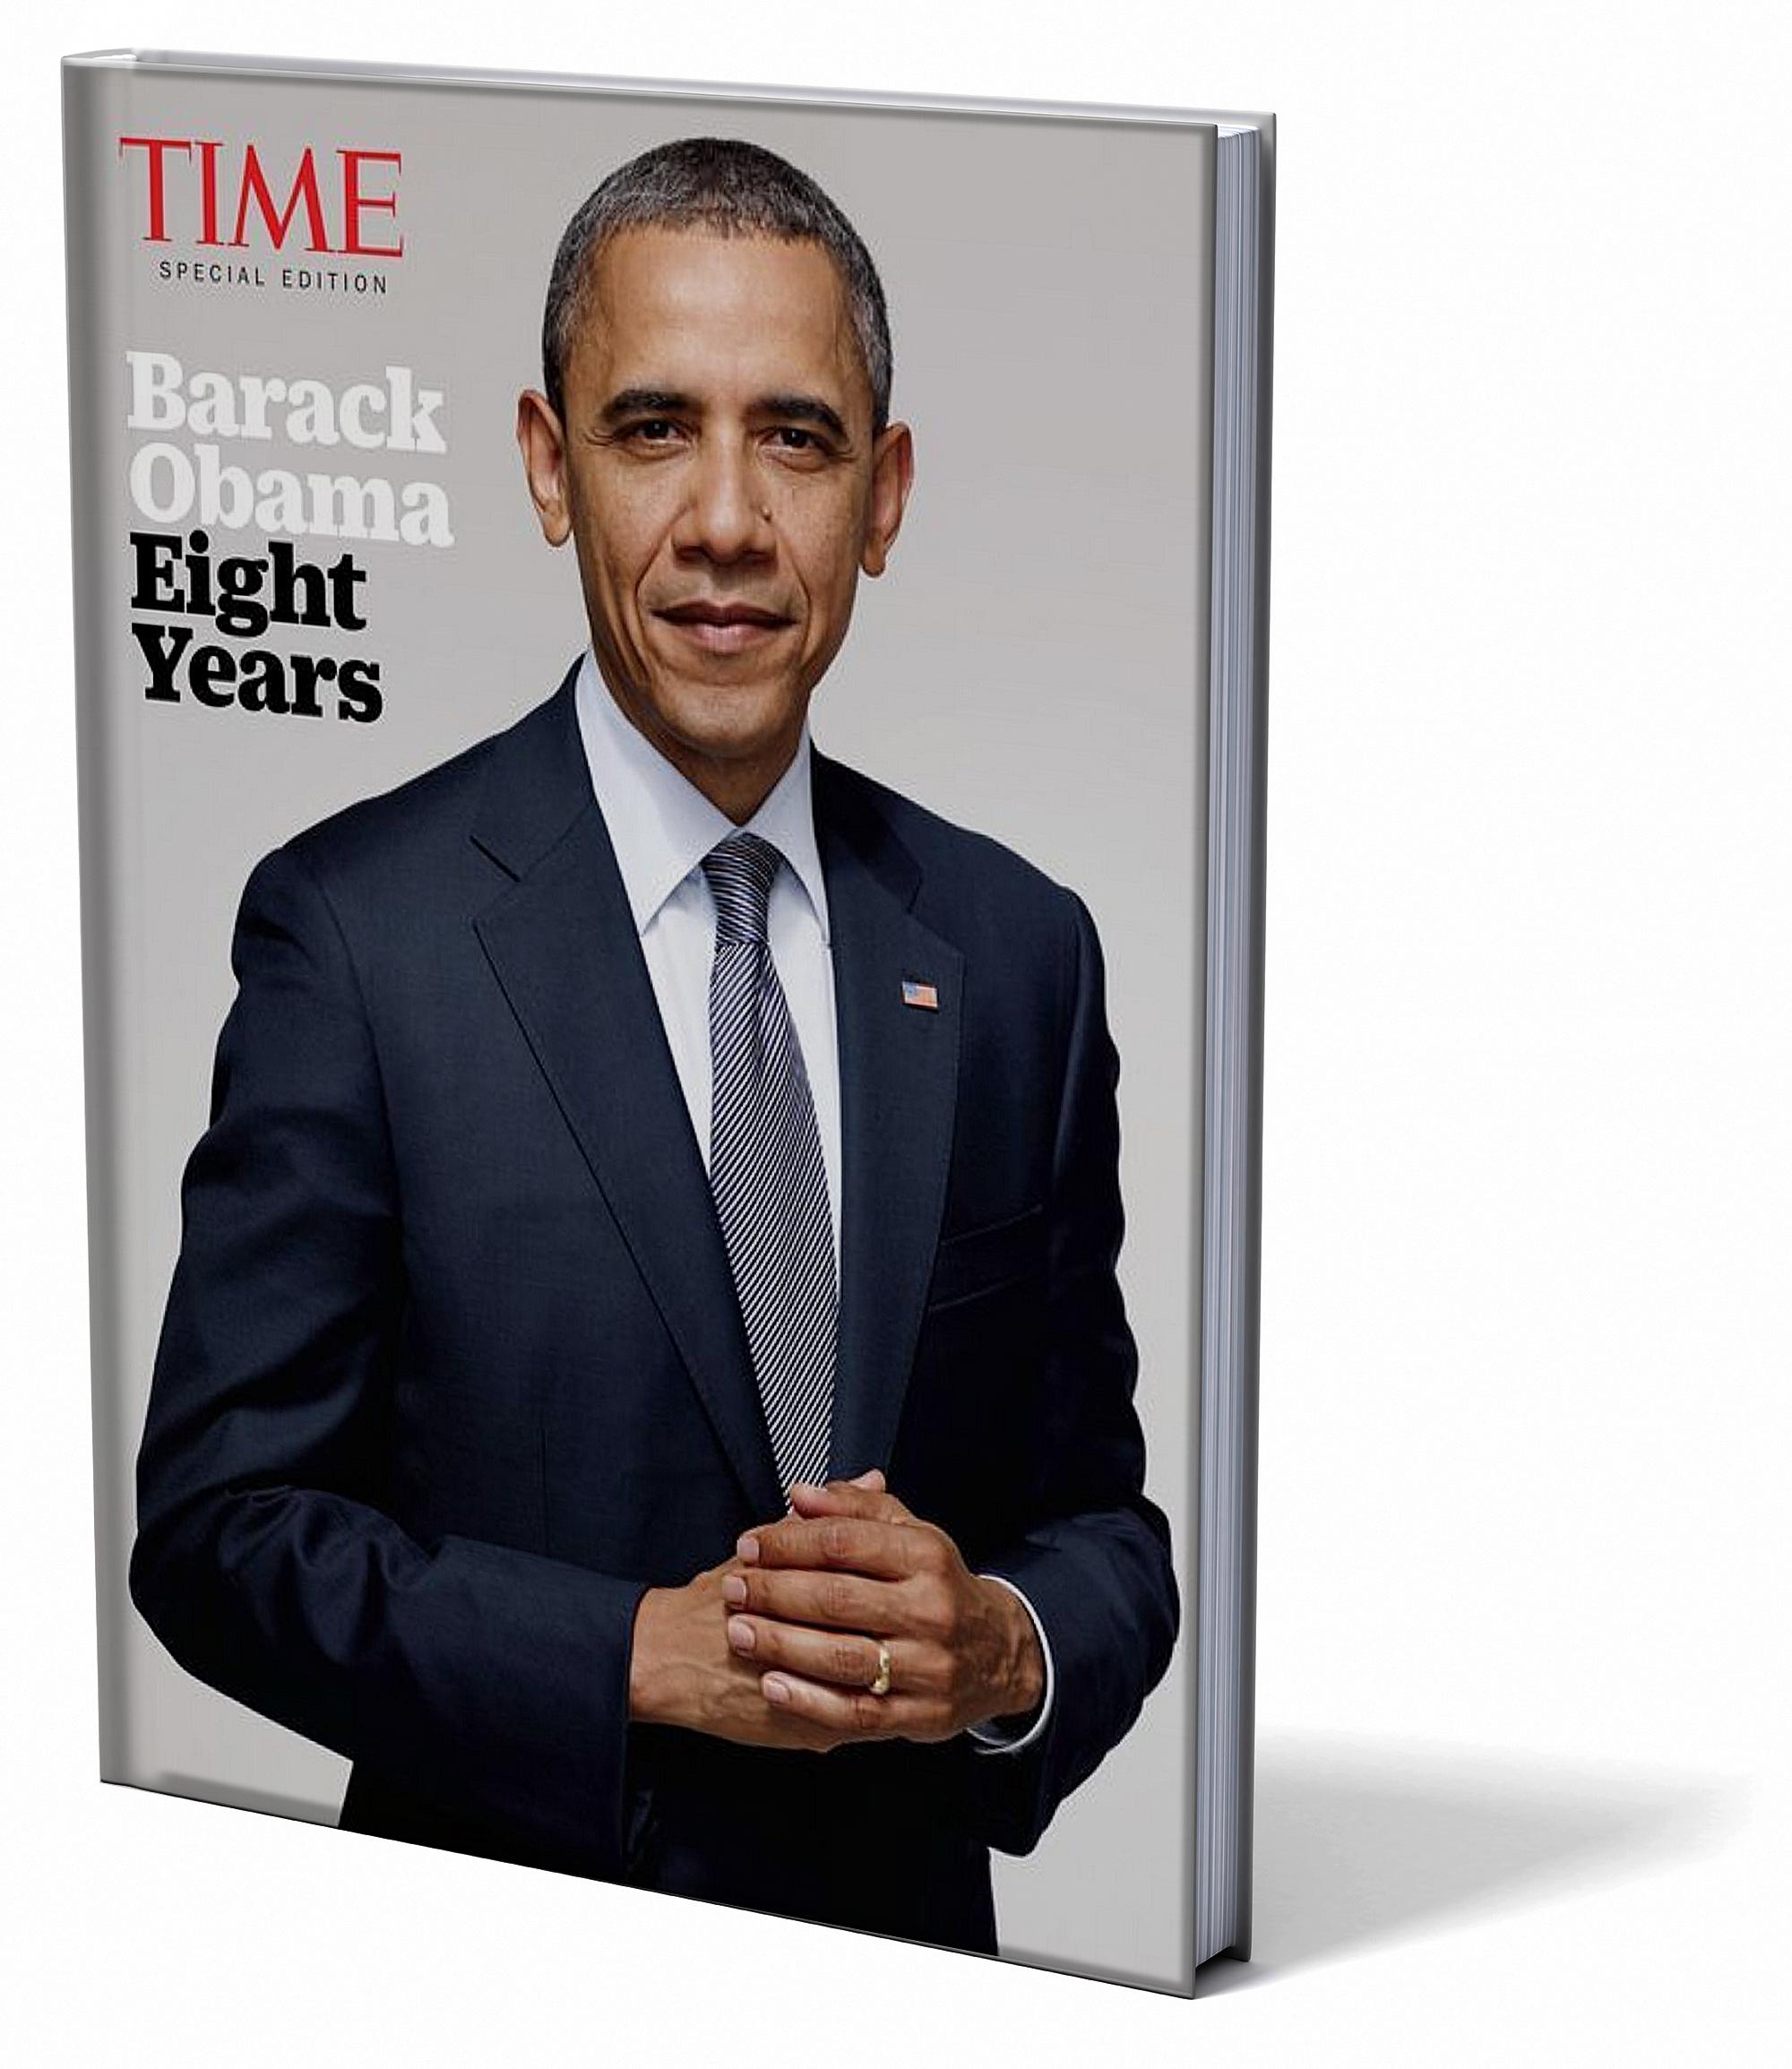 obamaeightyears.jpg